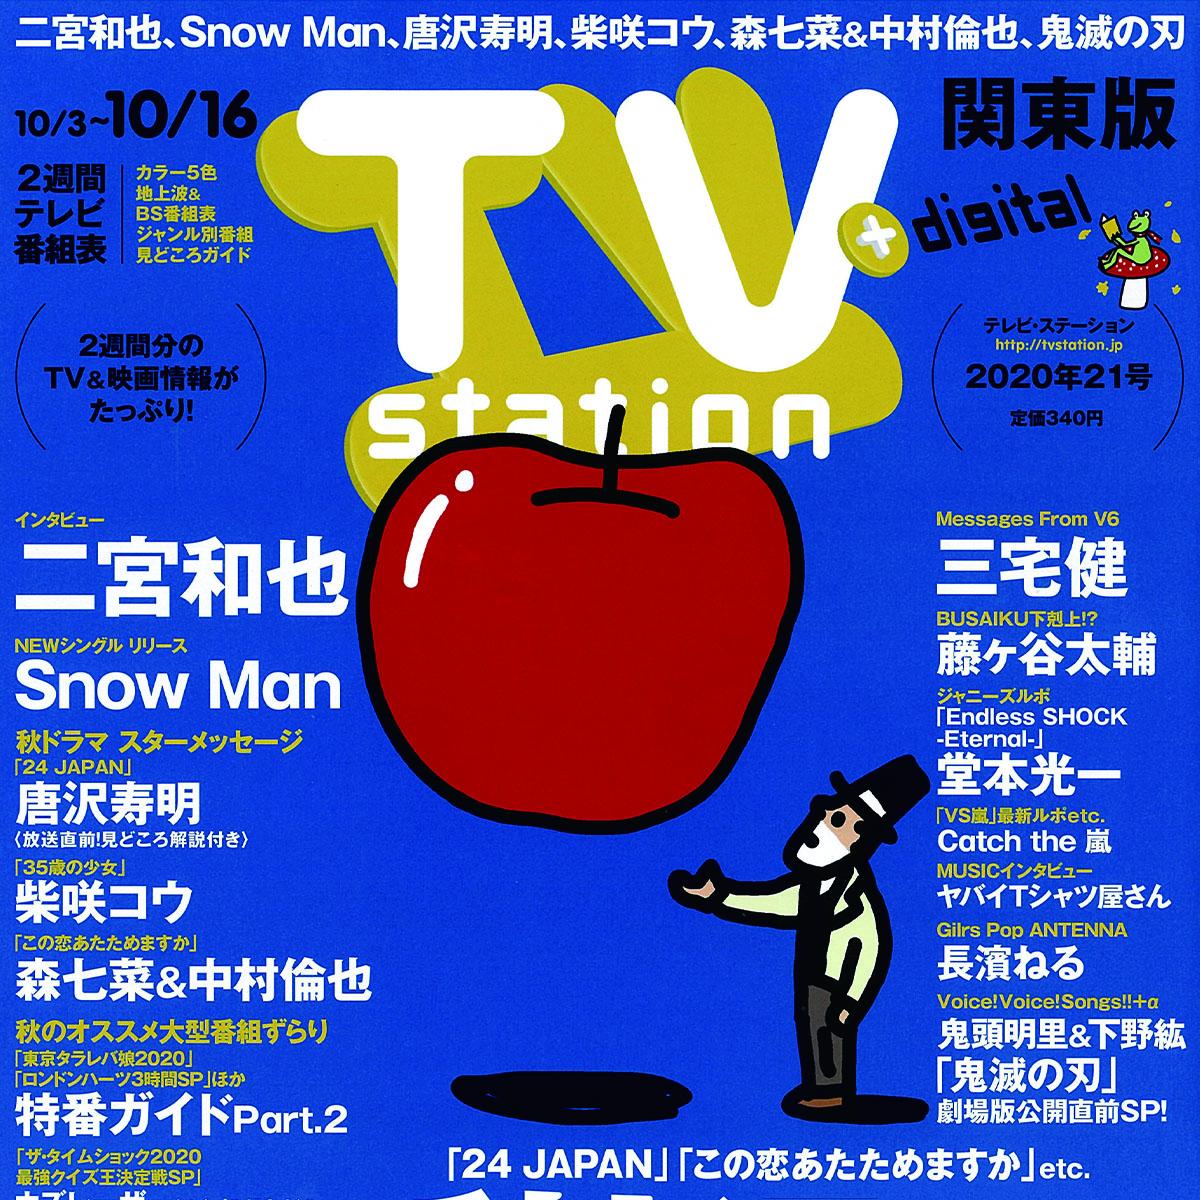 TV stationにて、V6 / 三宅健さんに着用いただいております